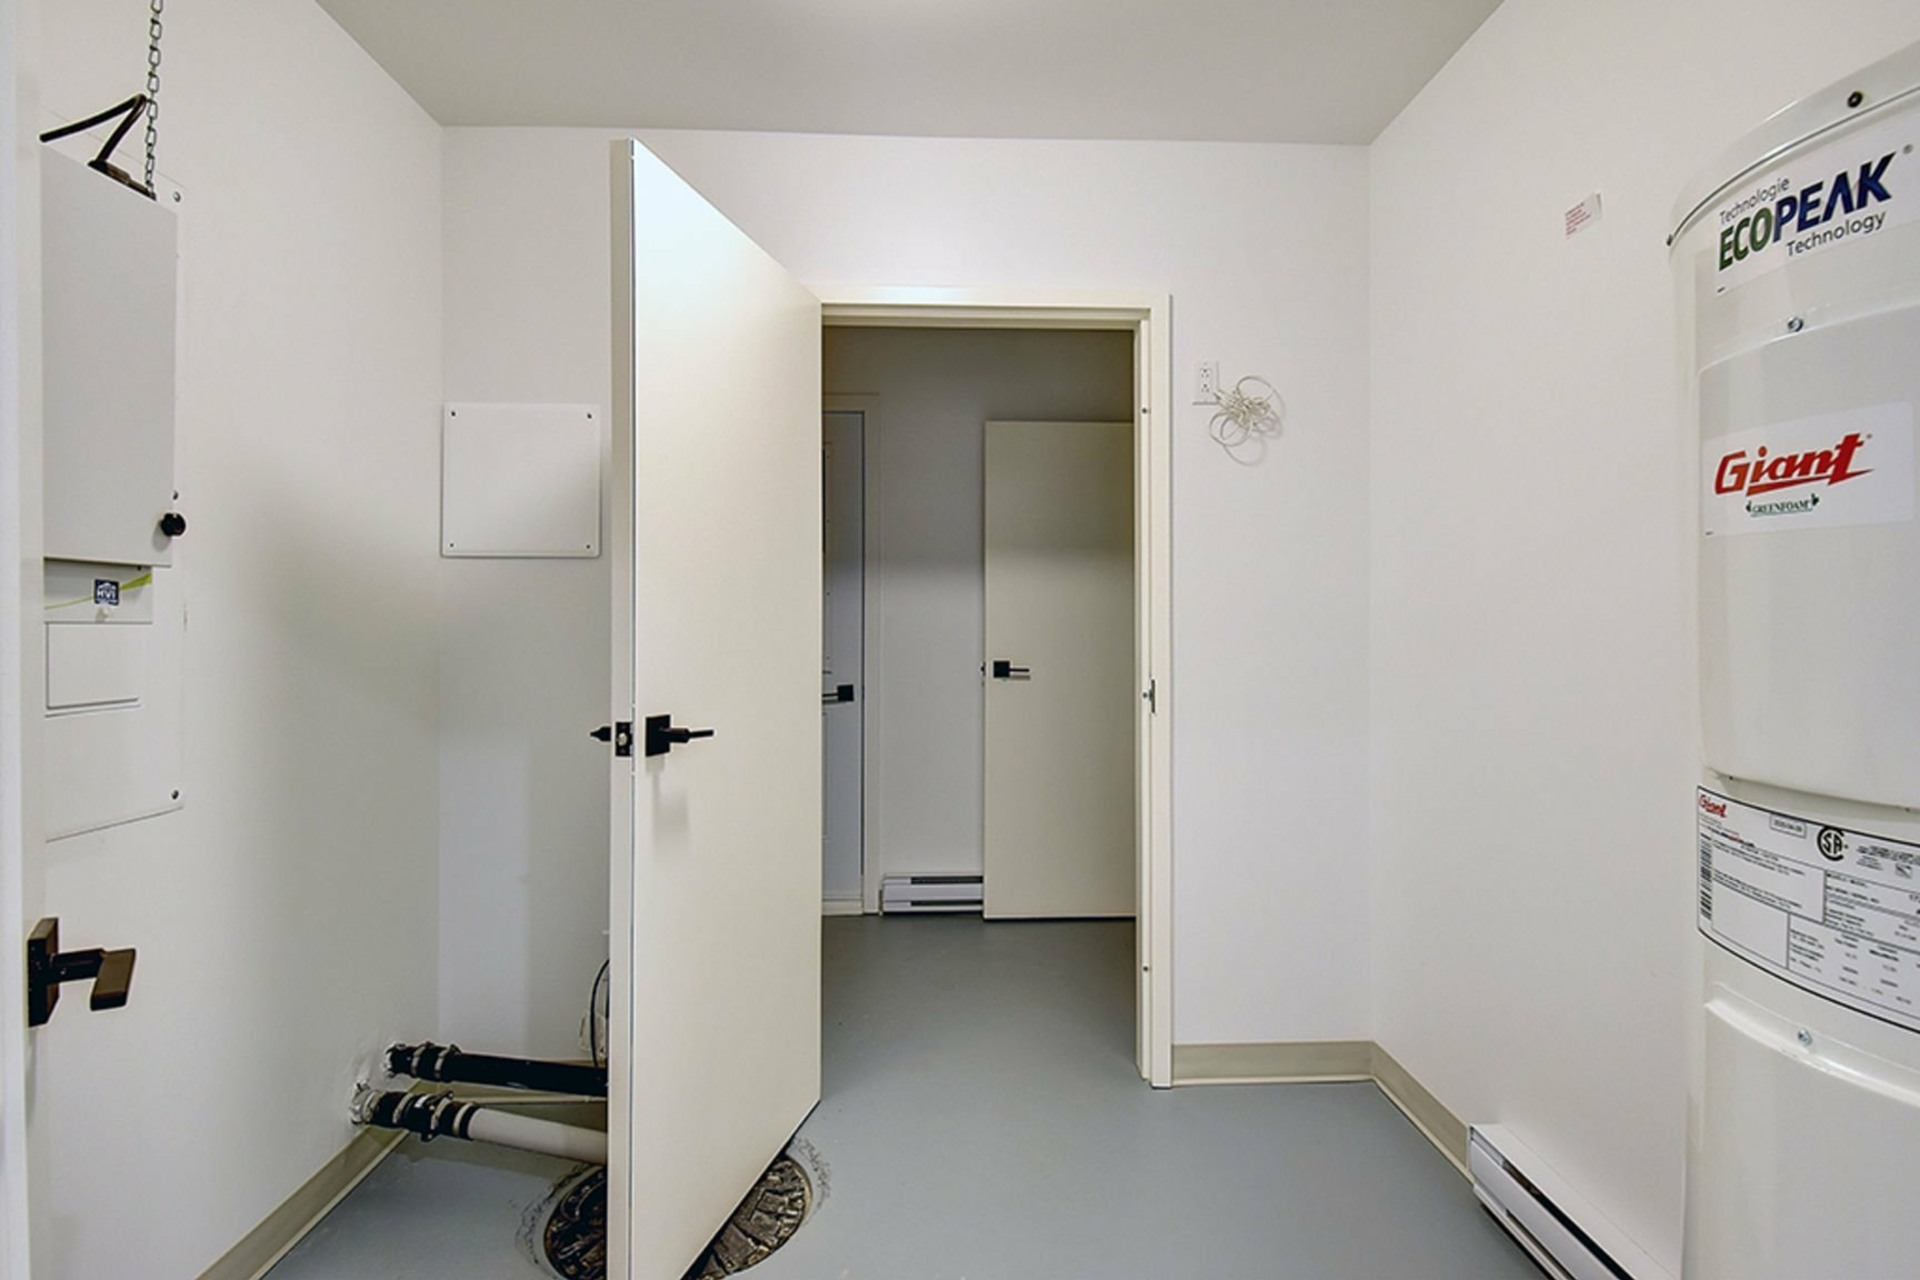 image 22 - Apartment For sale Le Vieux-Longueuil Longueuil  - 9 rooms